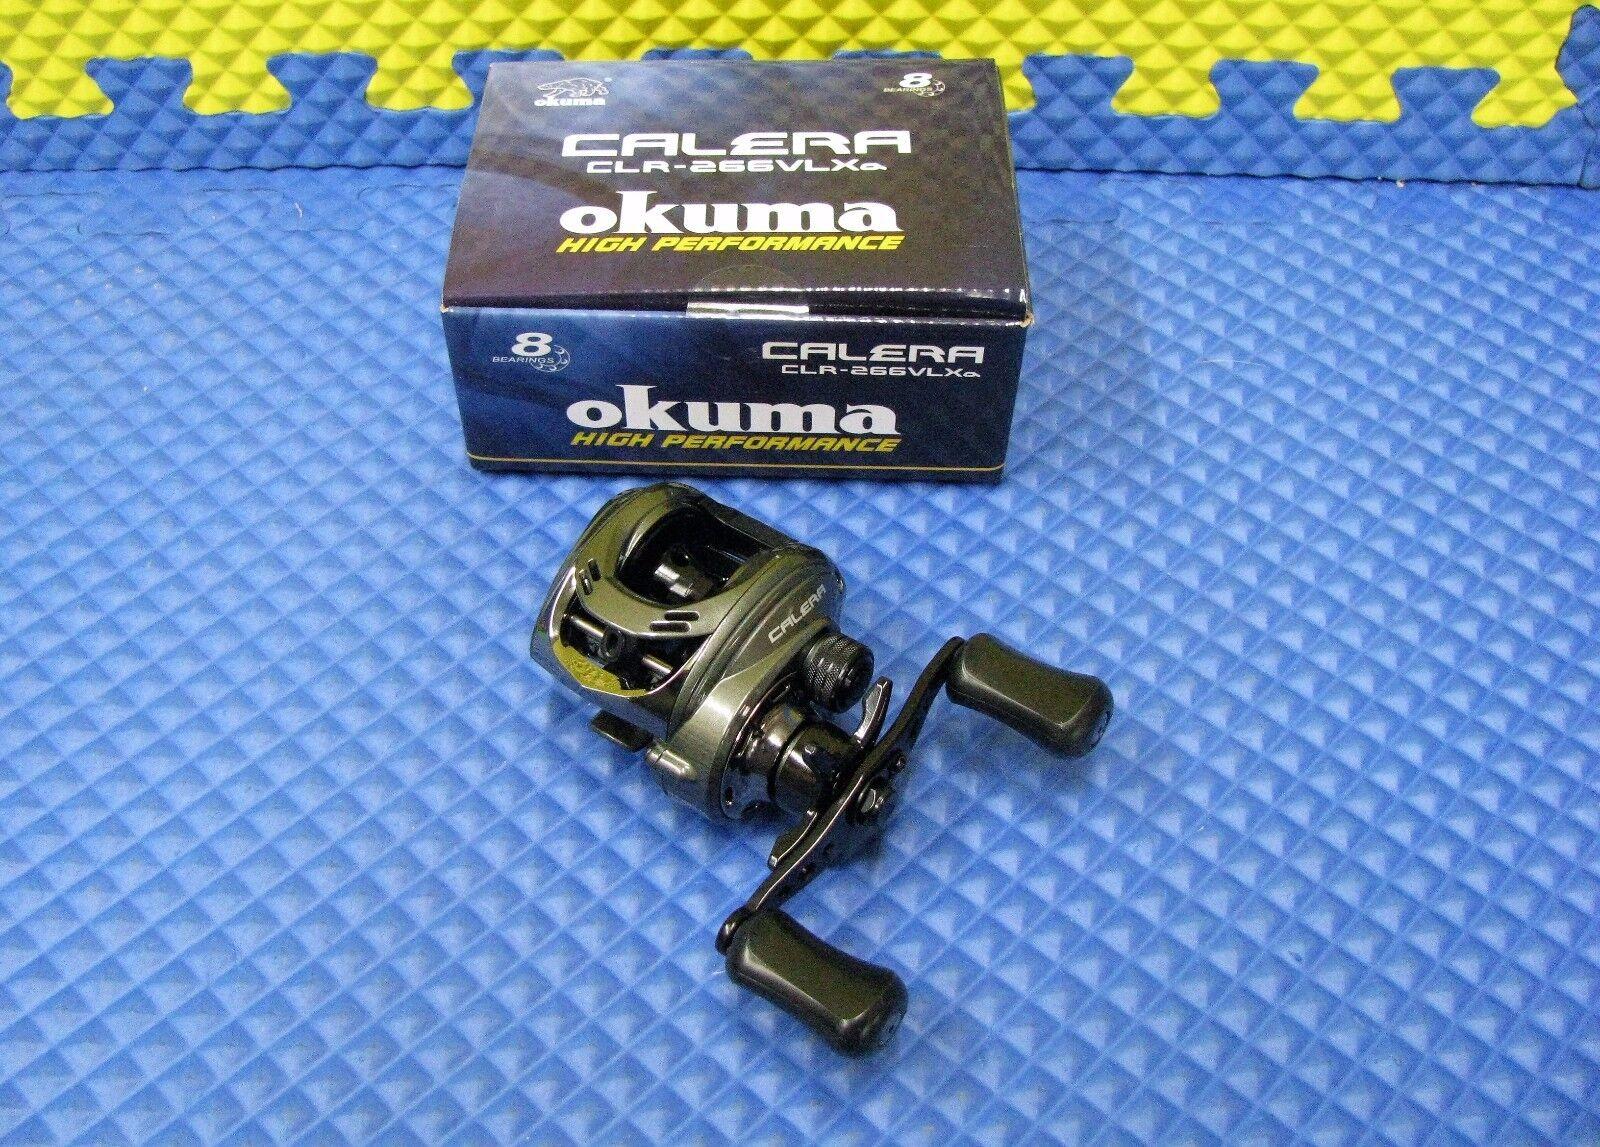 Okuma Calera Niedrig Profile Baitcast Reel Left-Handed CLR-266VLXa